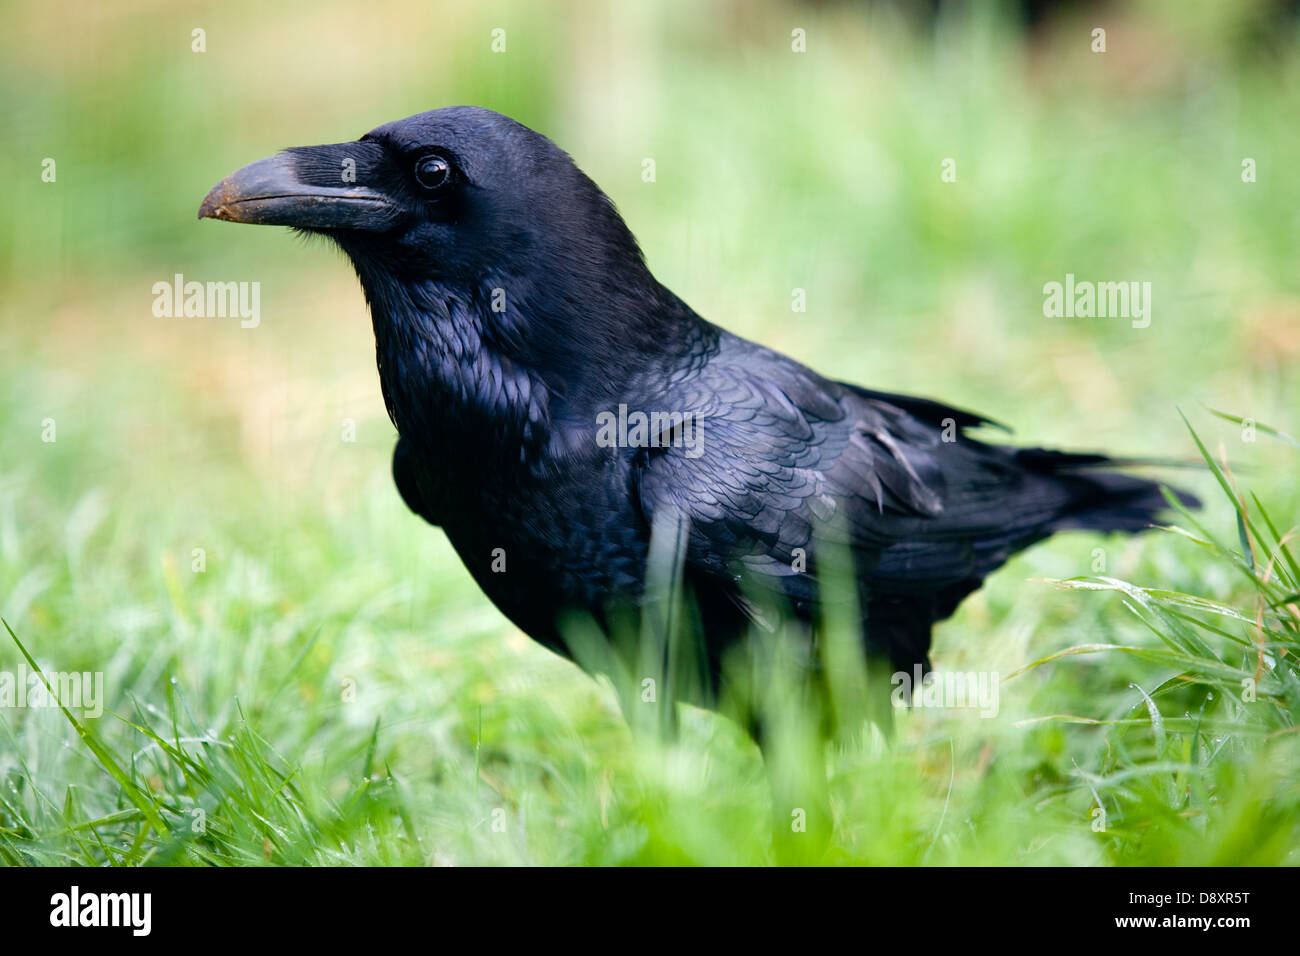 Rabe (Corvus Corax) im Grünland. Stockbild